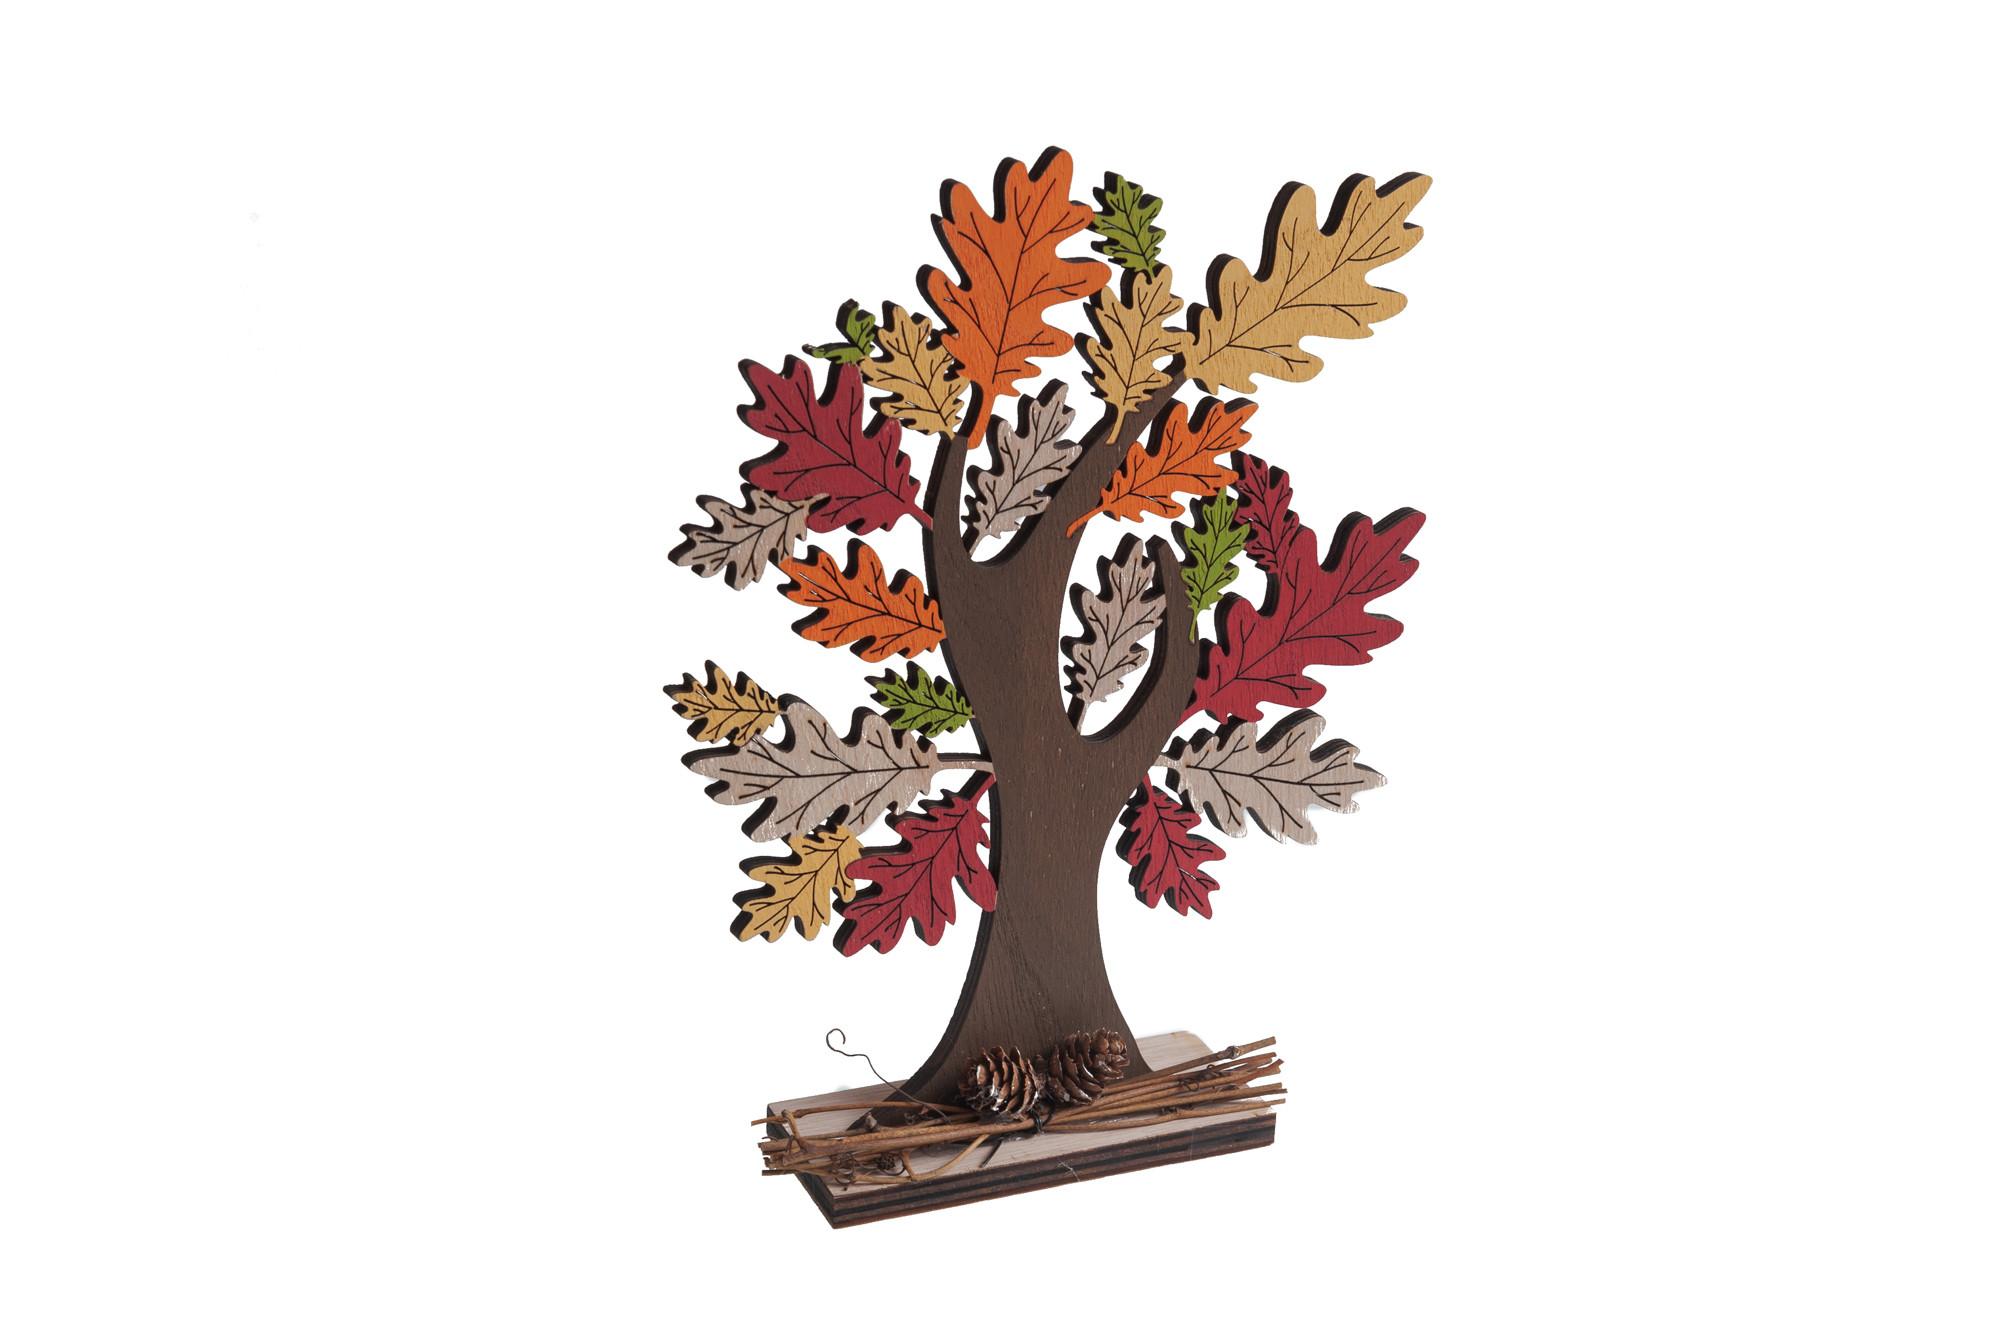 Podzimní strom 23 x 18 cm